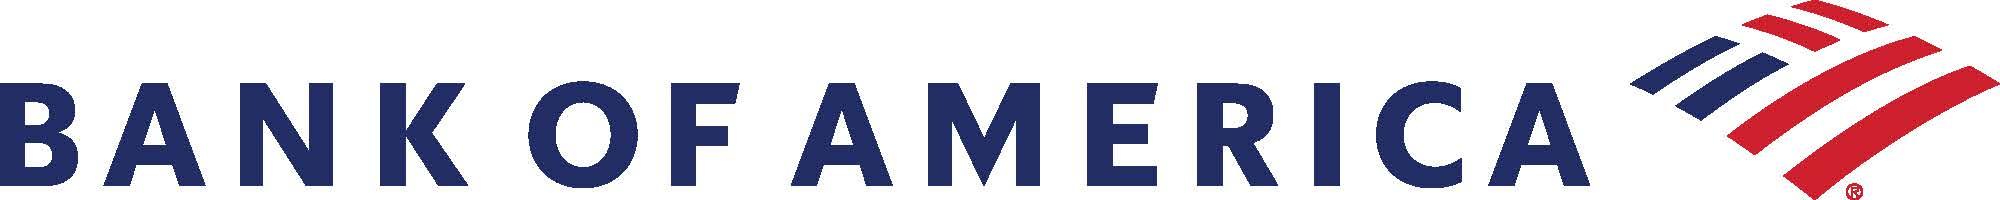 Banc of America Global Leasing - Global Corporate Aircraft Finance logo